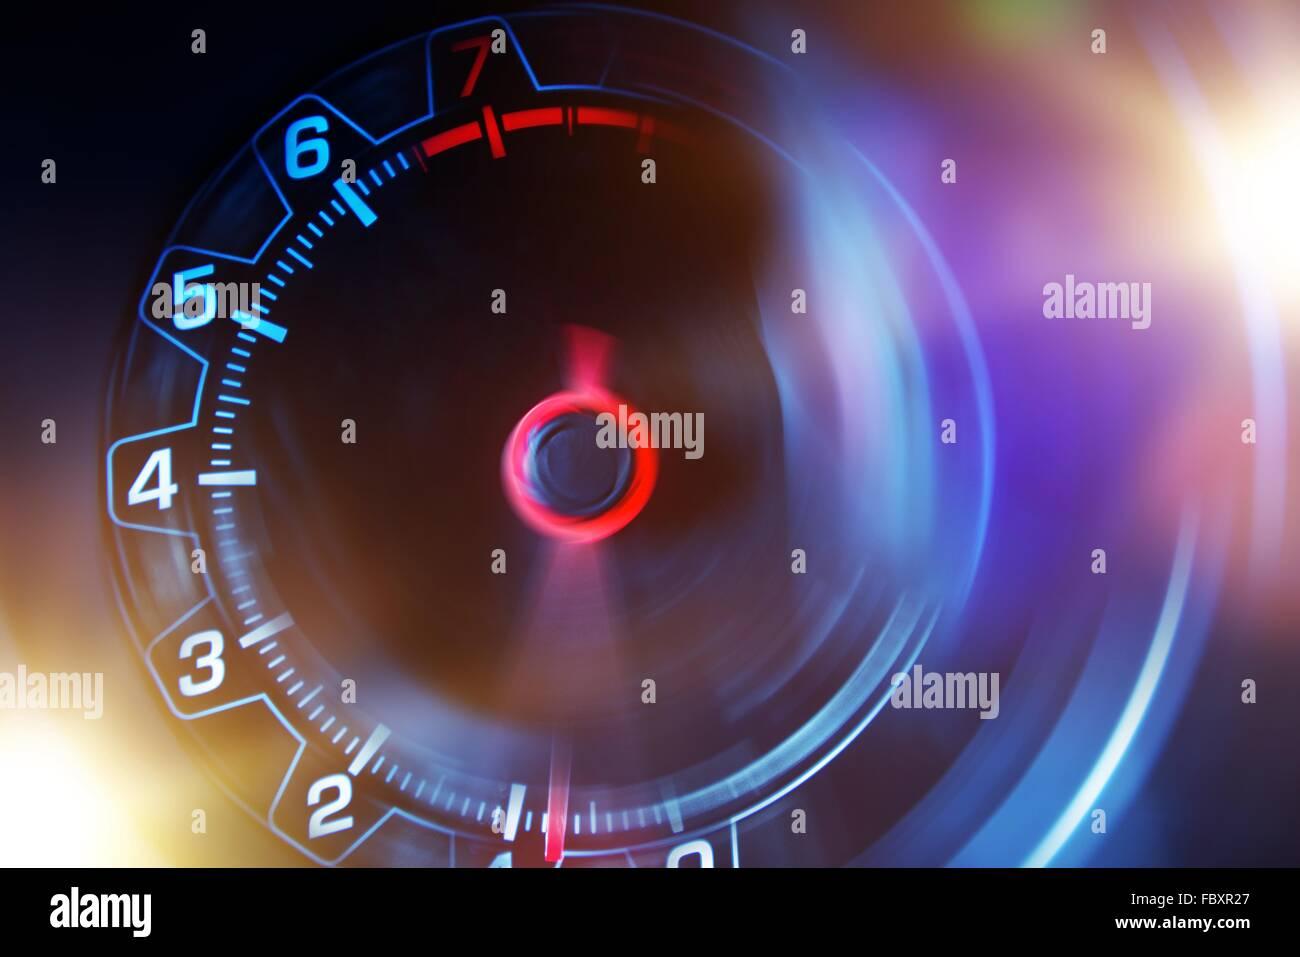 Blurred Revolution Counter Automotive Concept. Car Tachometer Concept. - Stock Image